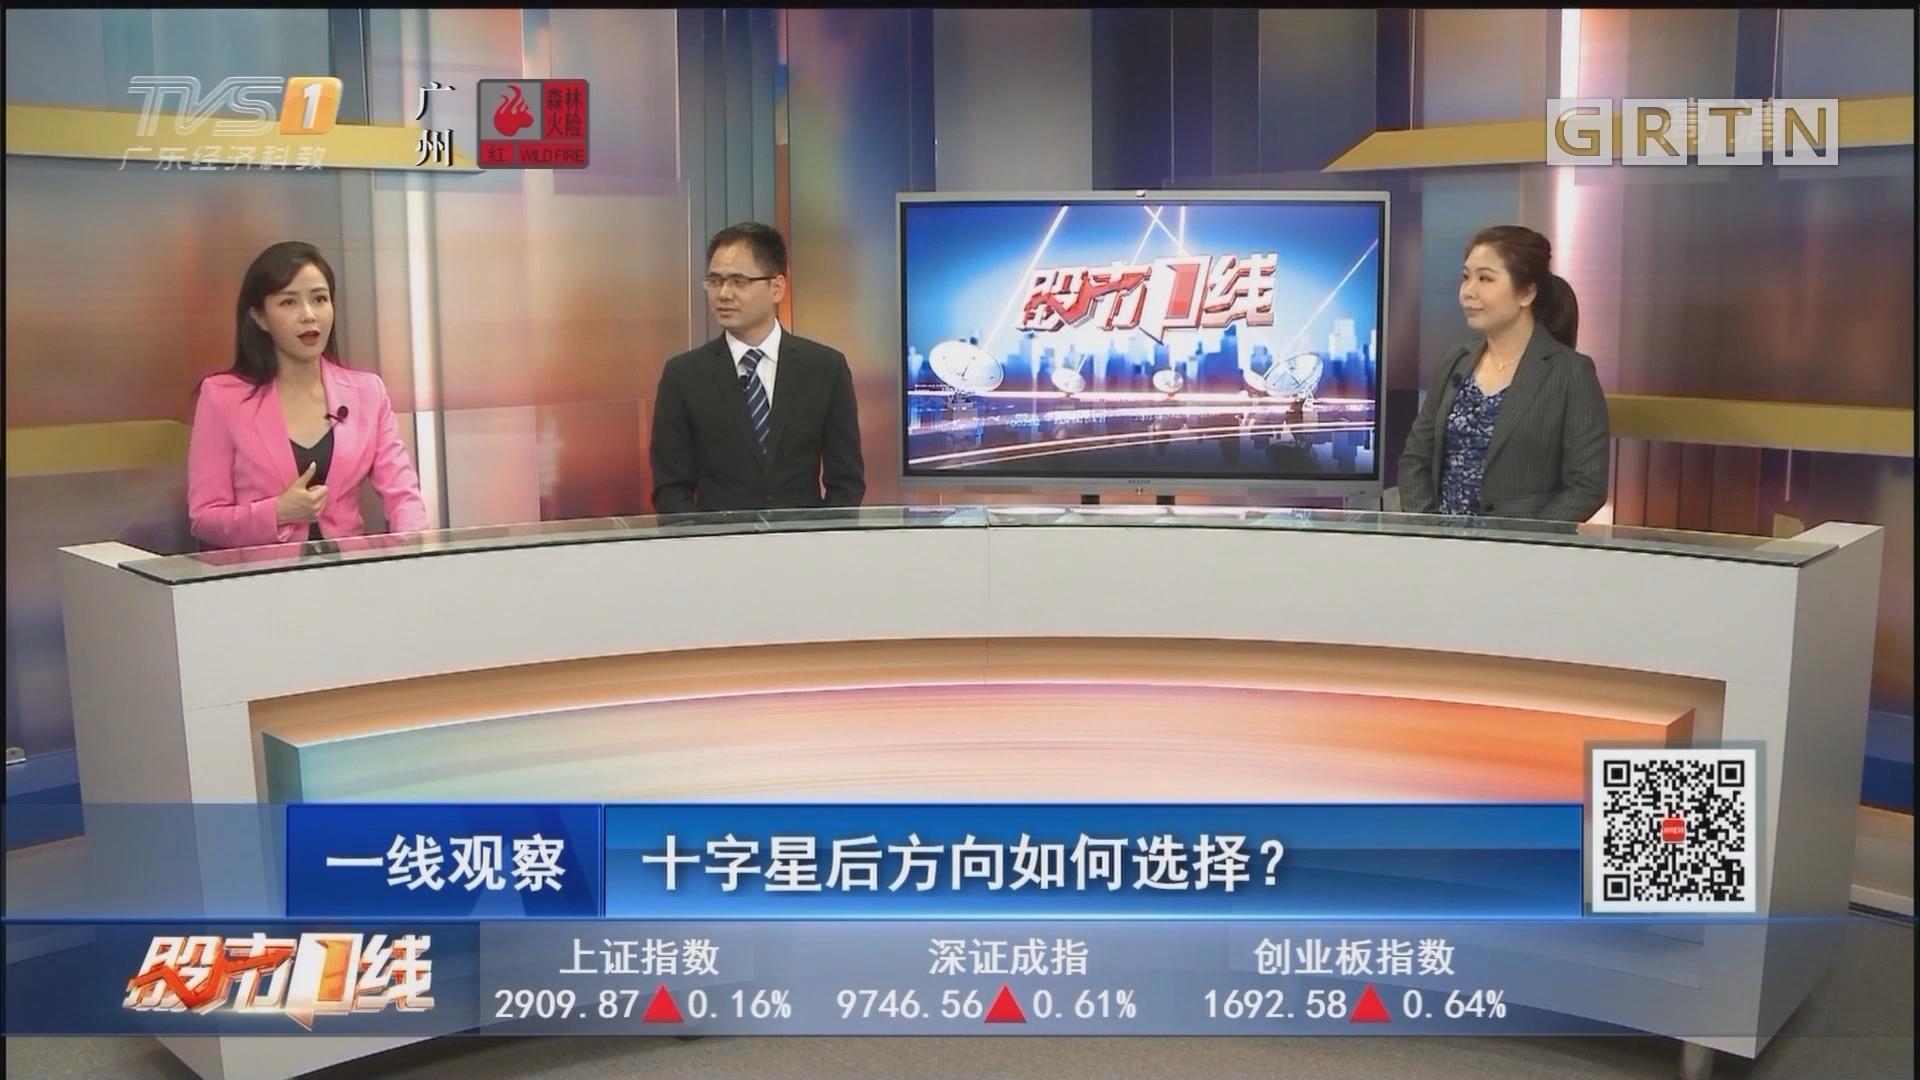 [HD][2019-11-14]股市一线:十字星后方向如何选择?